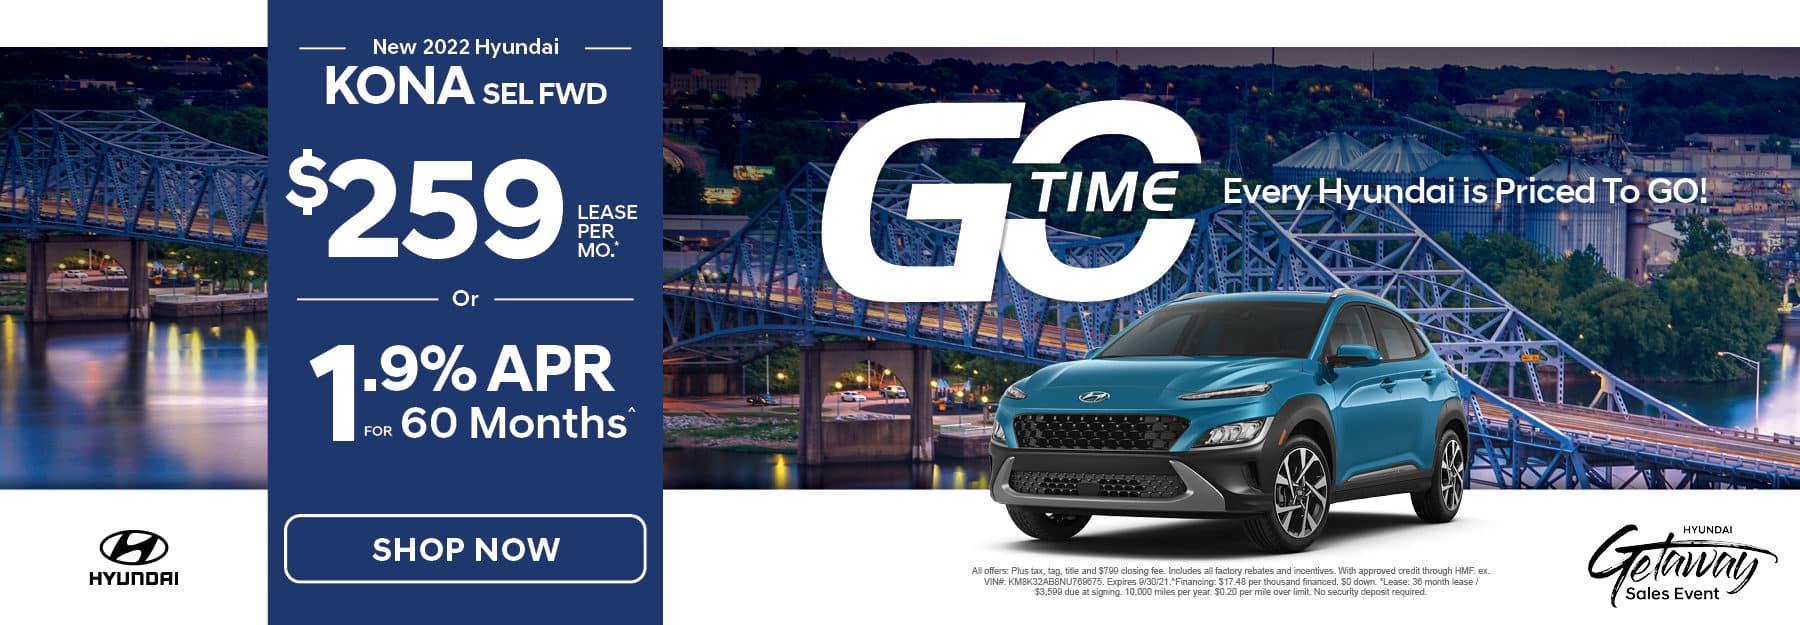 Go Time - New 2021 Hyundai Kona